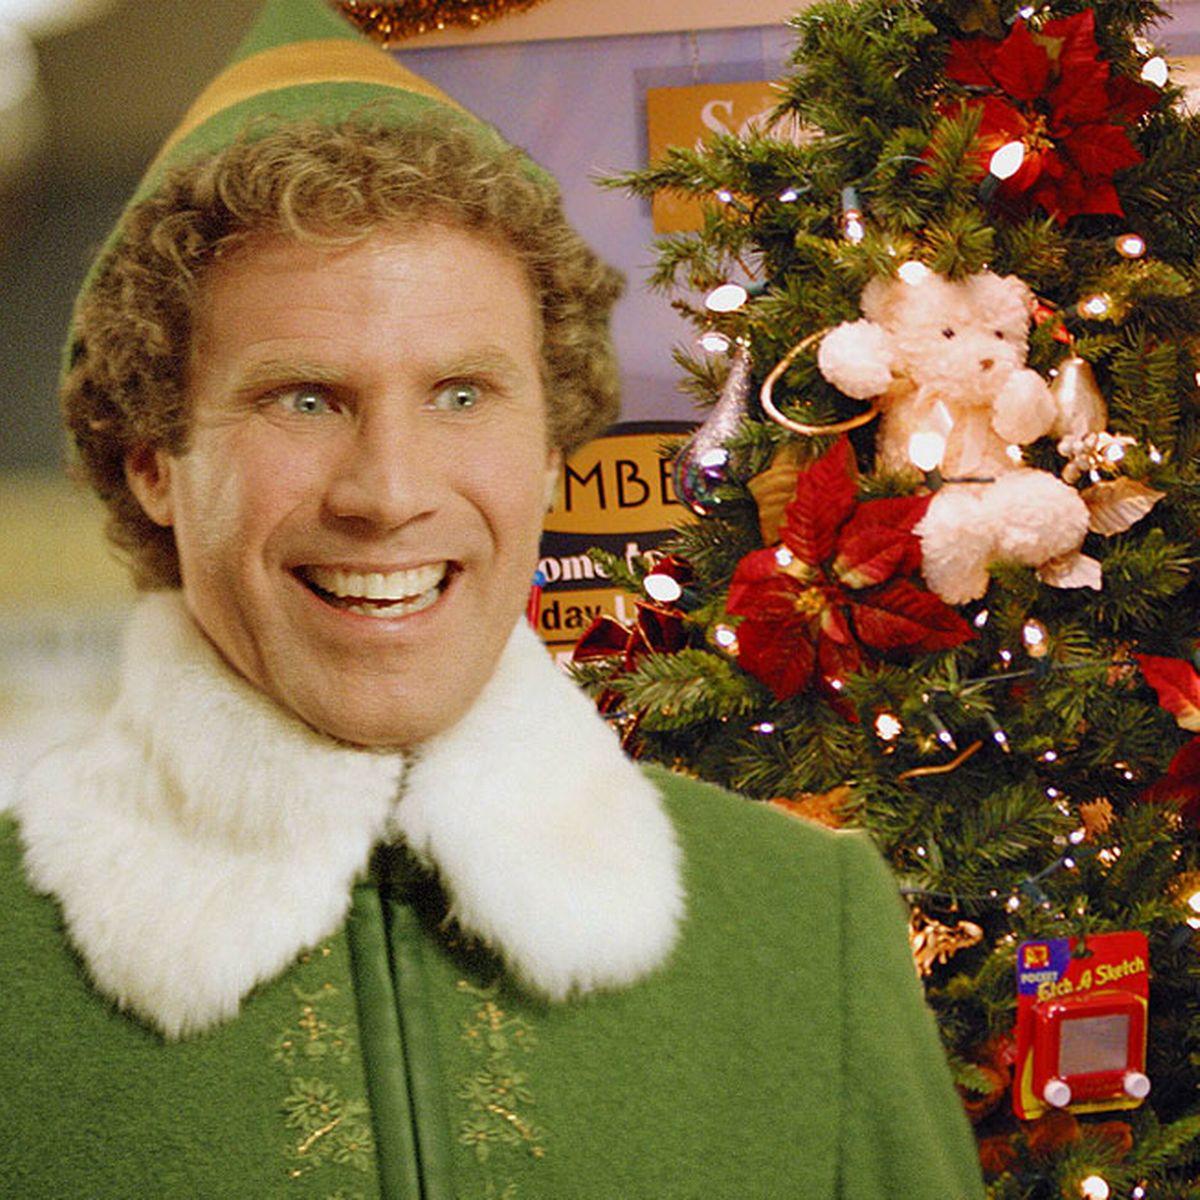 10 classic Christmas movies